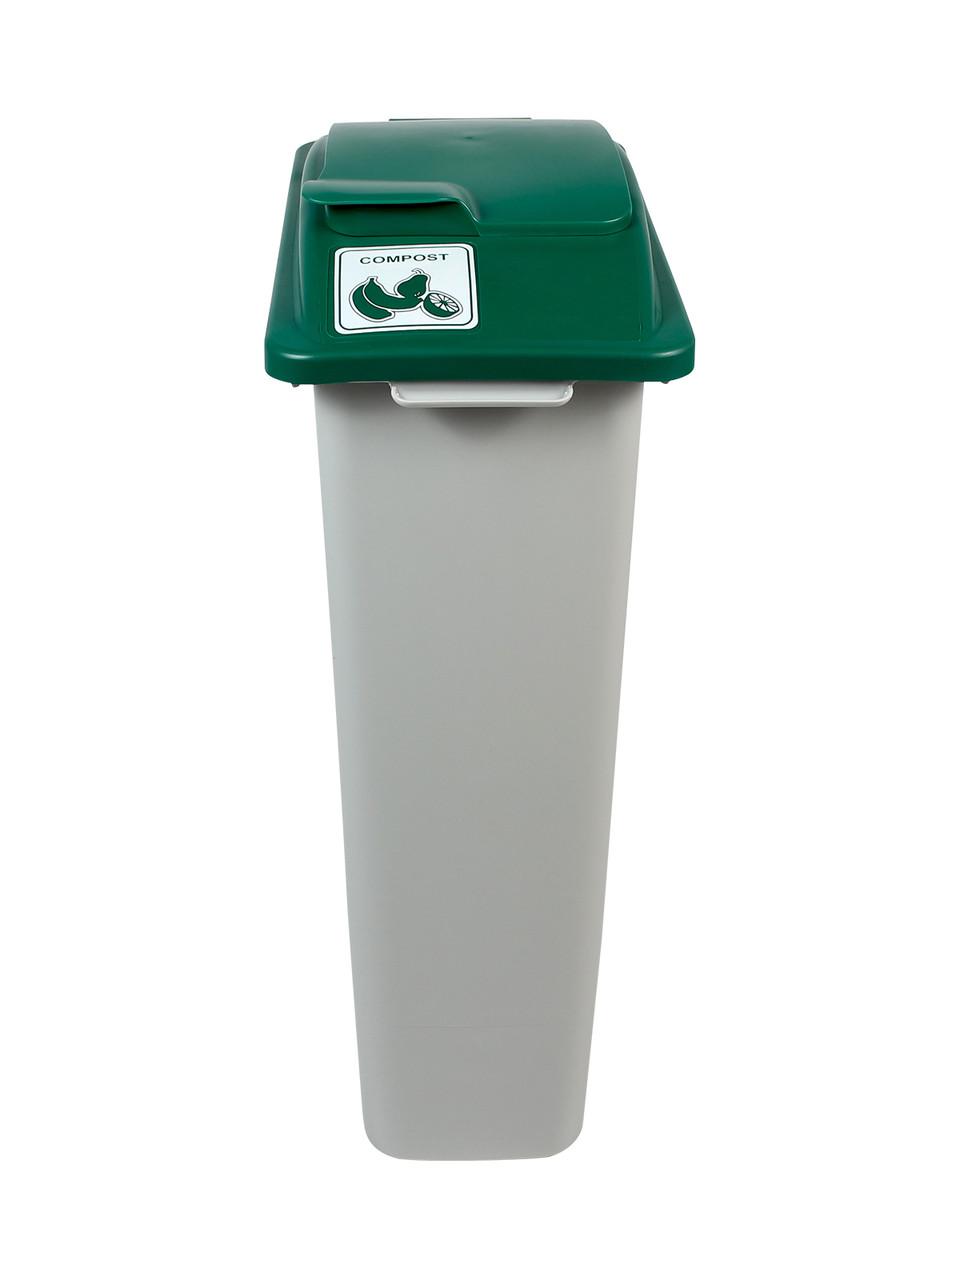 23 Gallon Skinny Simple Sort Compost Bin Lift Top